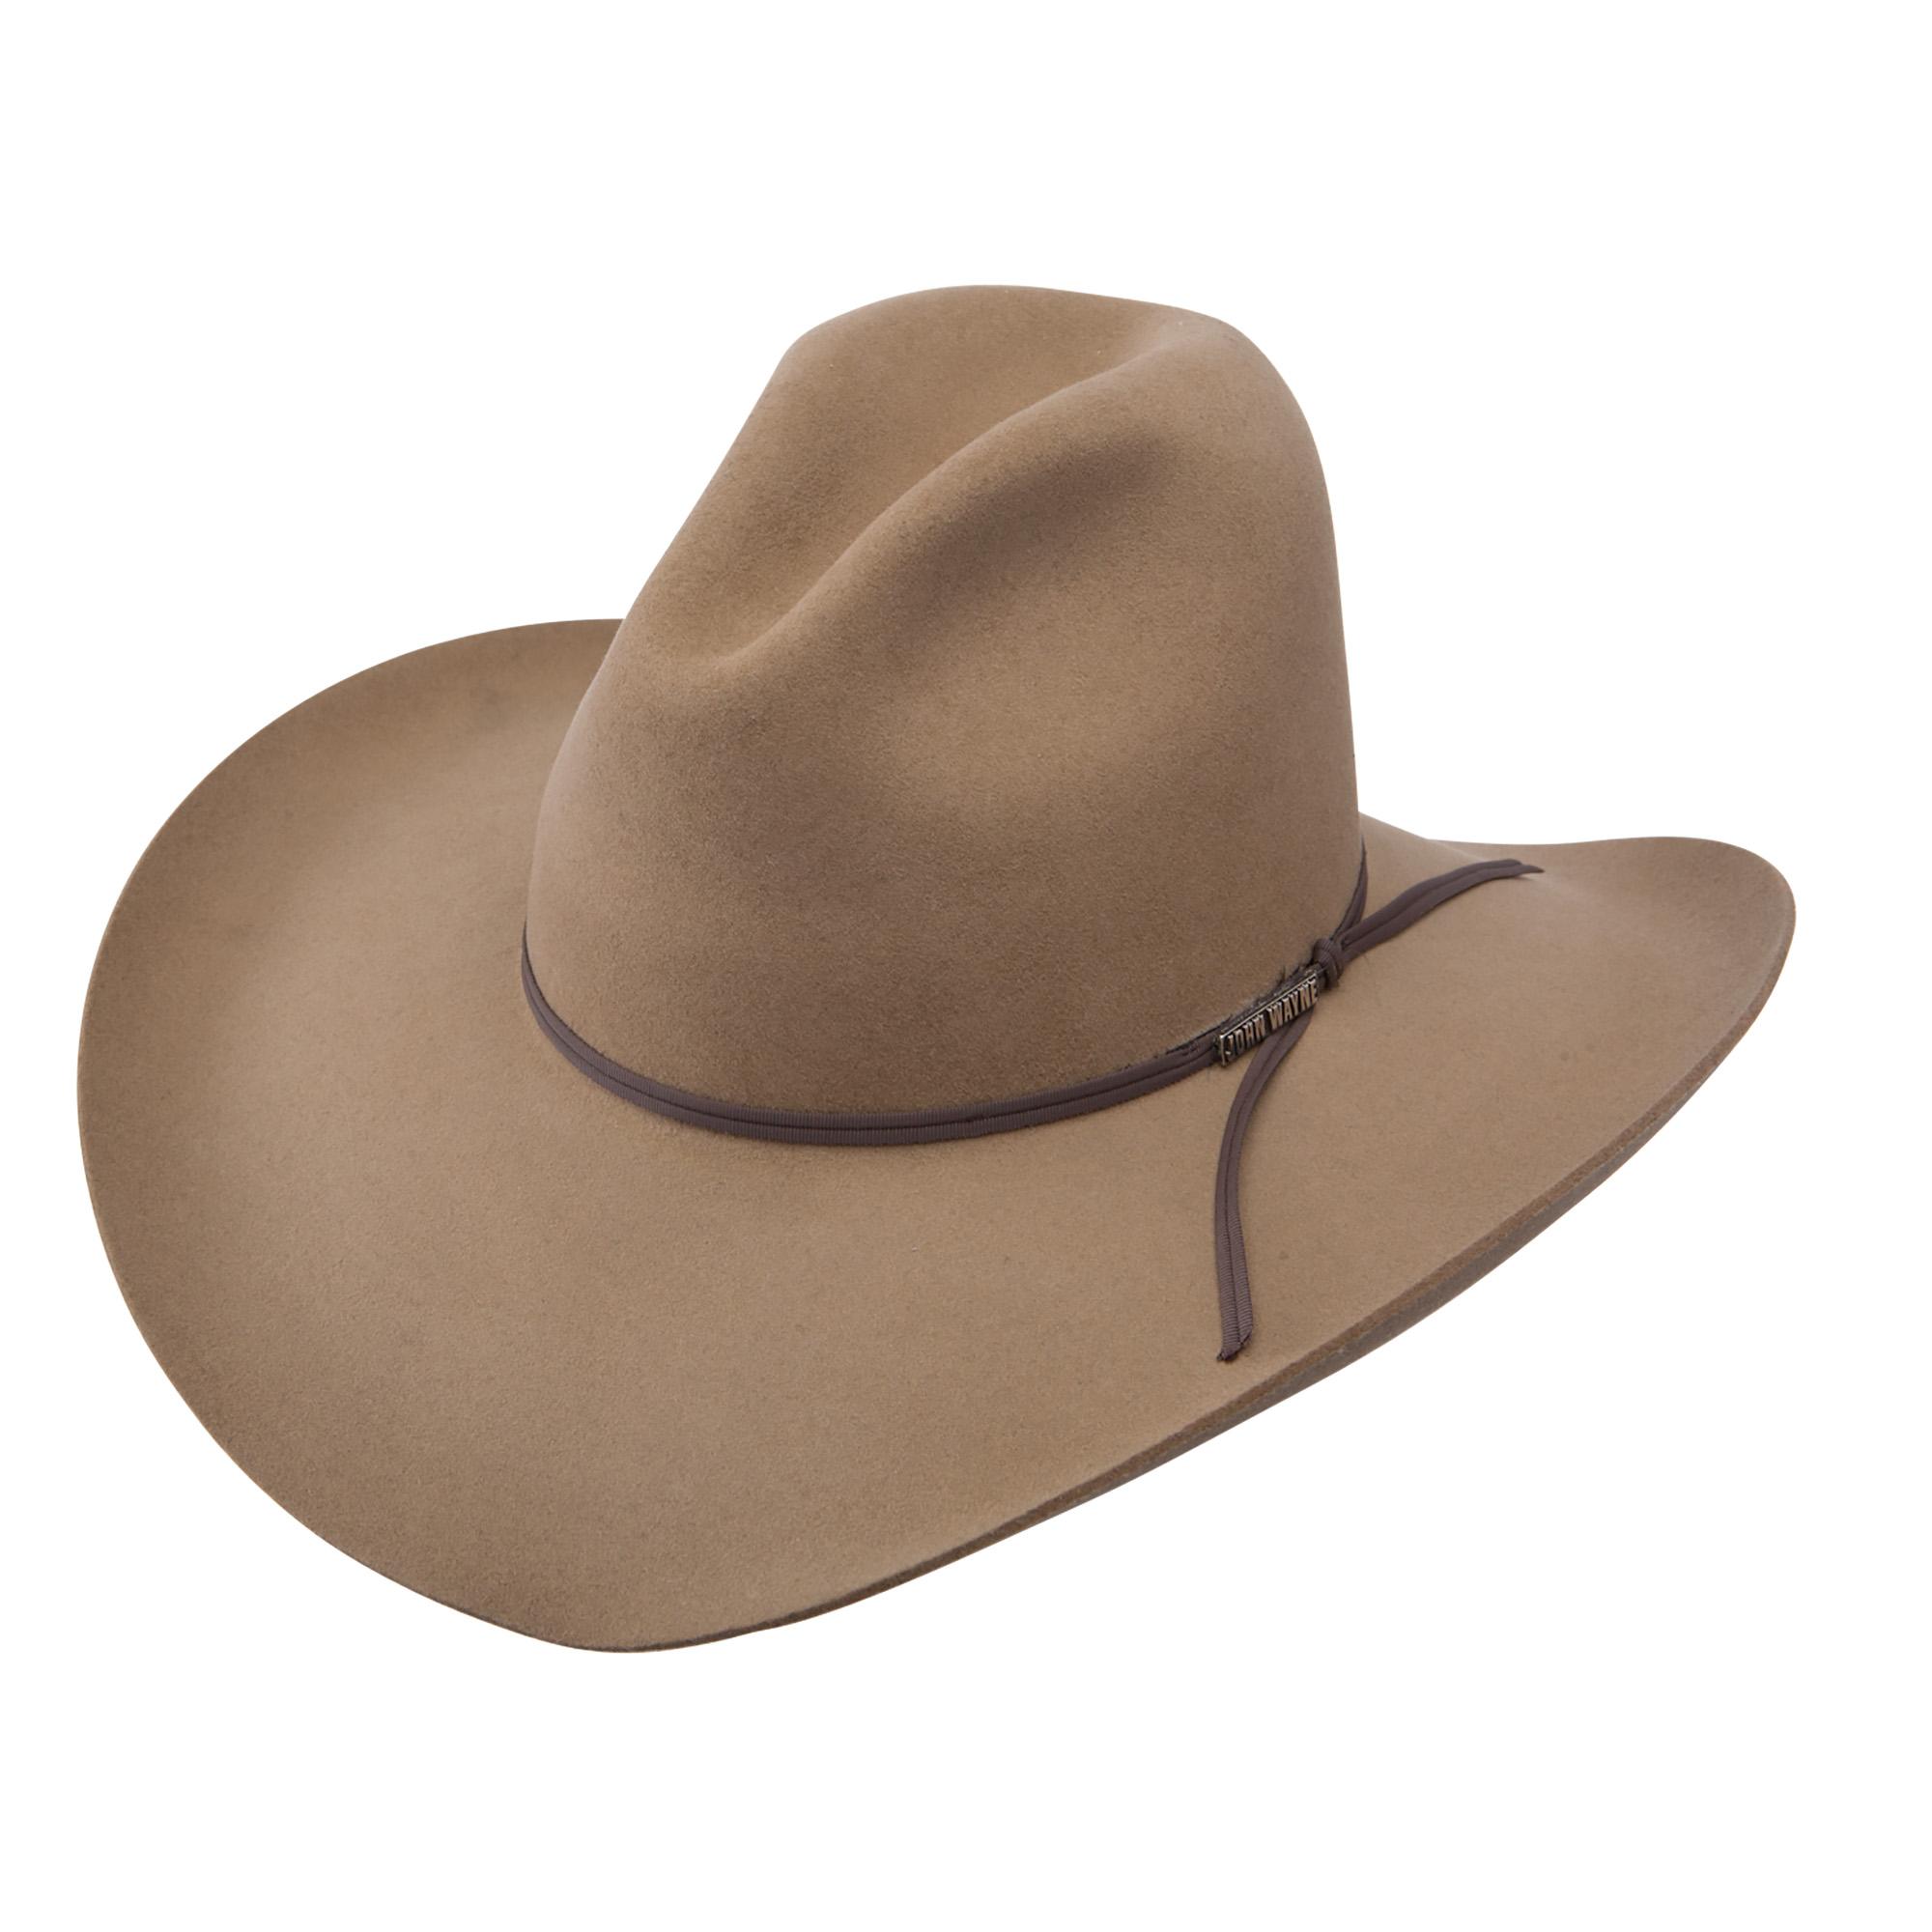 RESISTOL JOHN WAYNE FORT CRUSHABLE WOOL COWBOY WESTERN HAT